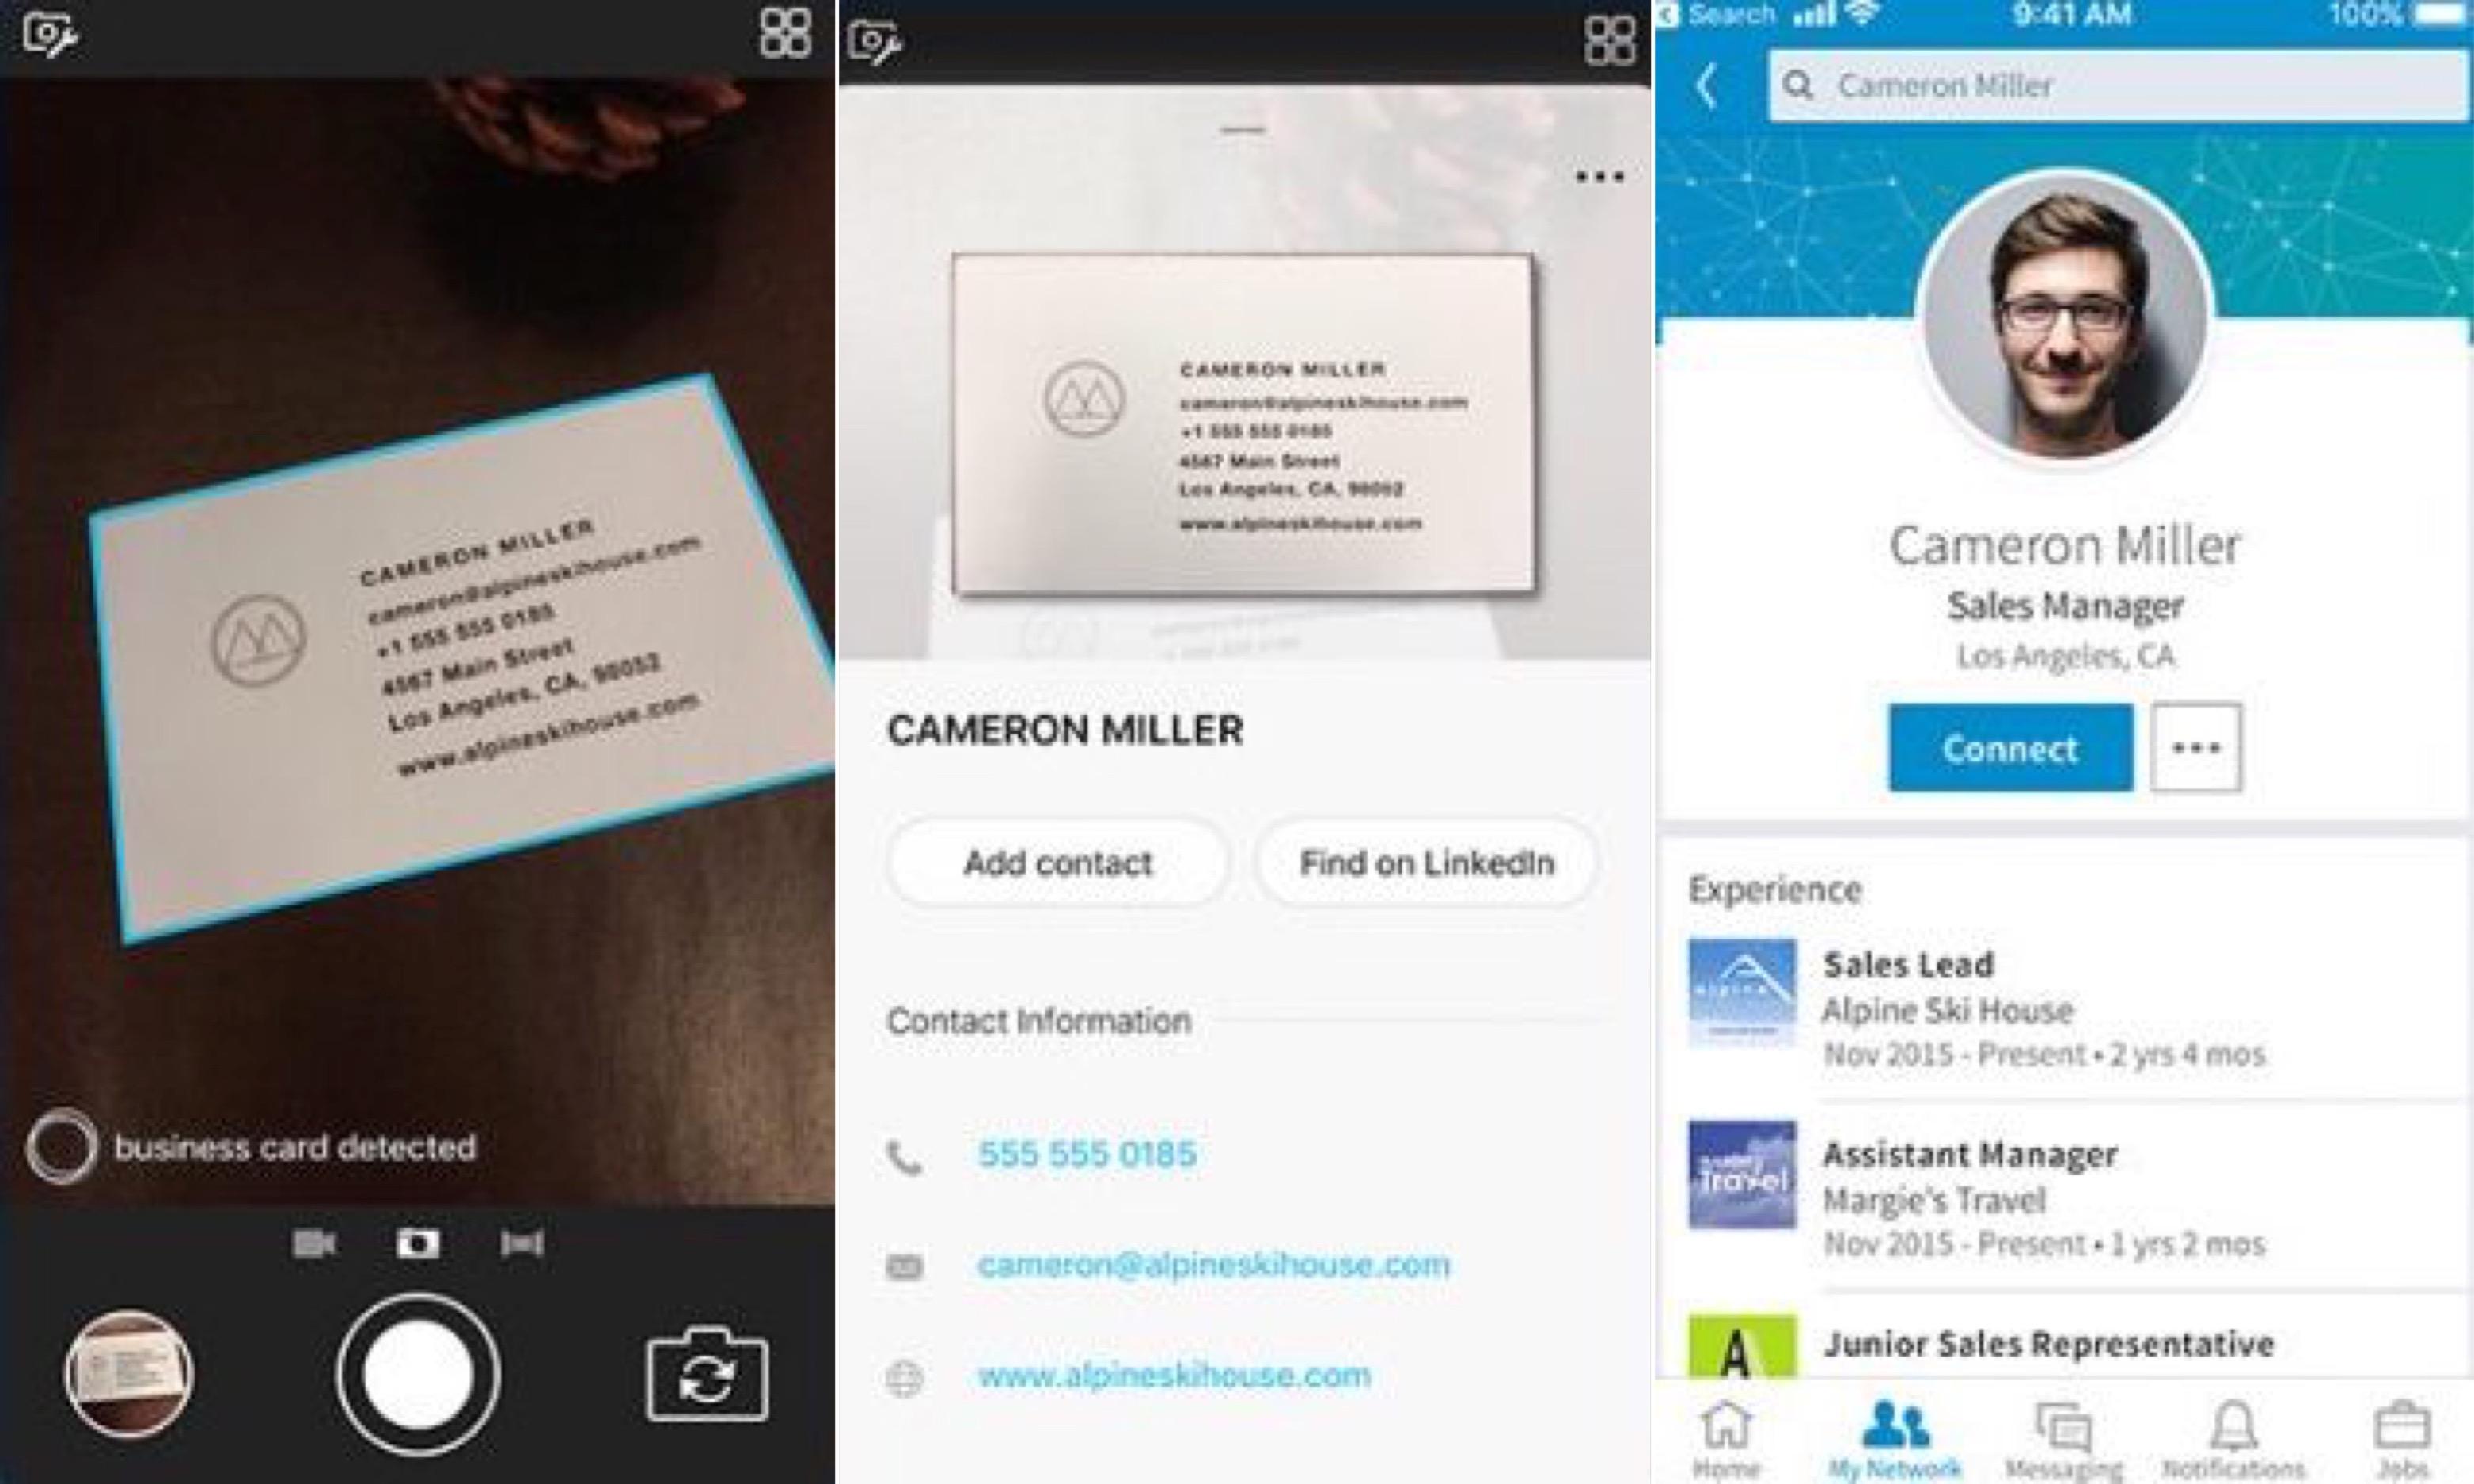 Microsoft Pix Detecte Carte Visite Contacts 2